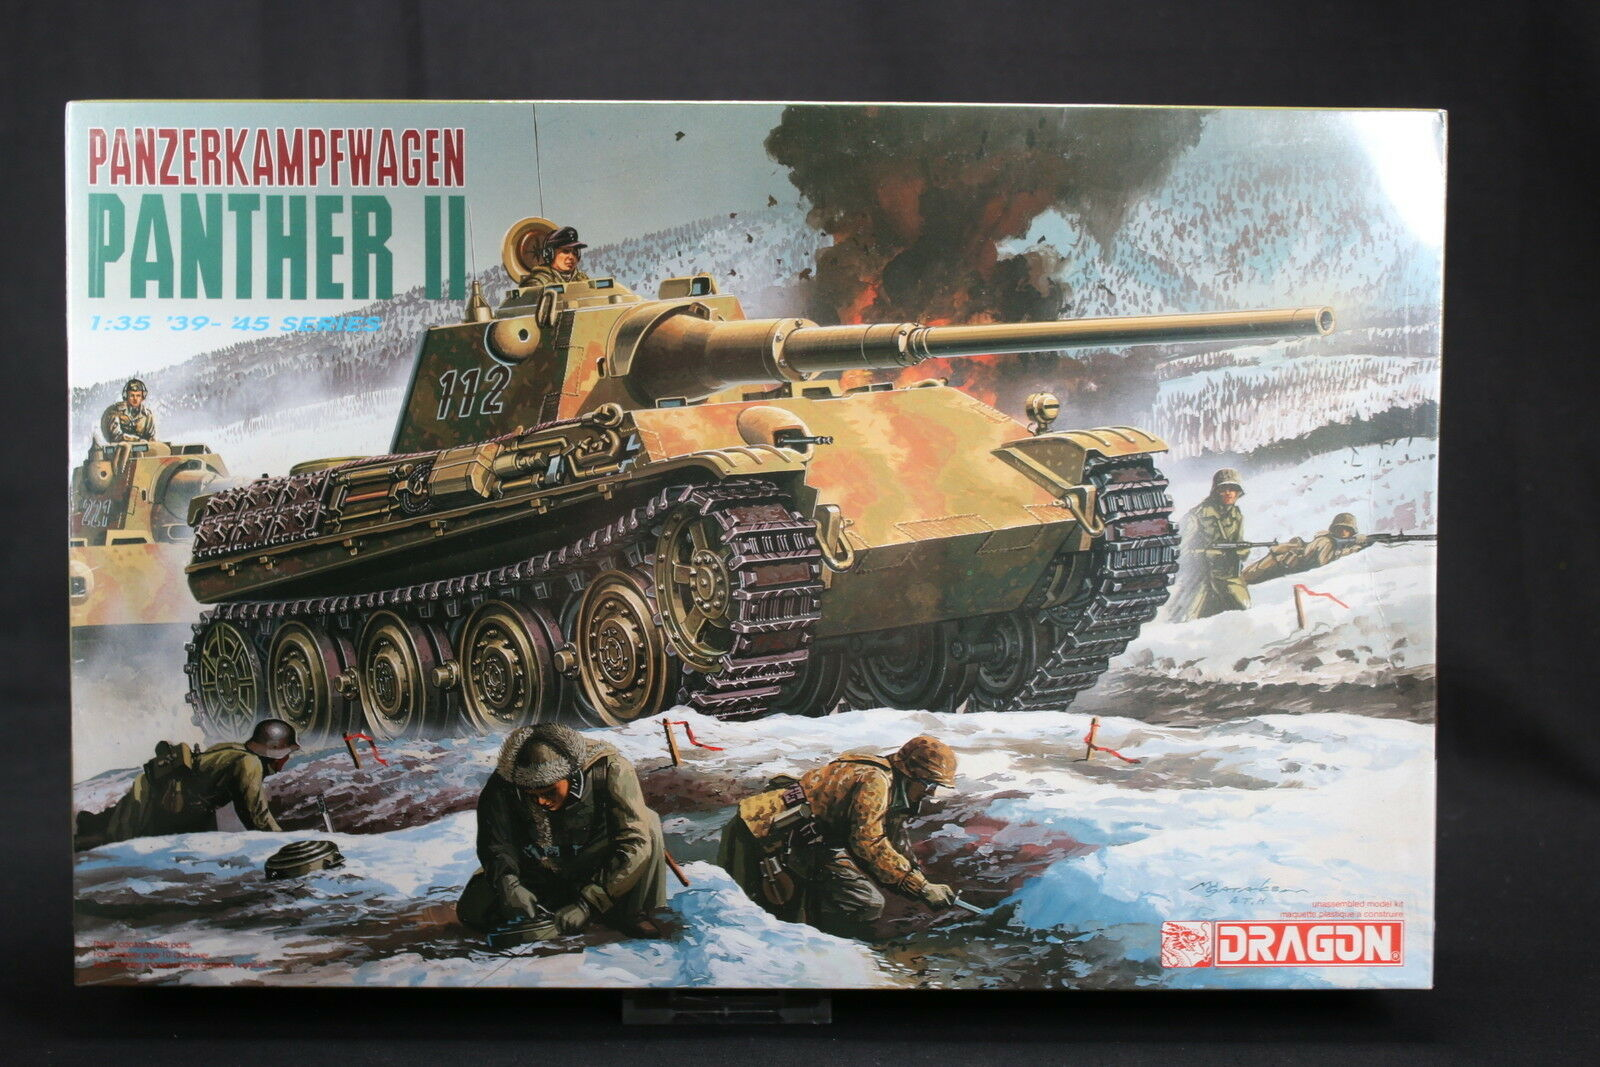 orden en línea YL072 DRAGON 1 35 maquette tank char 6027 6027 6027 Panzerkampfwagen Panther II WWII  saludable